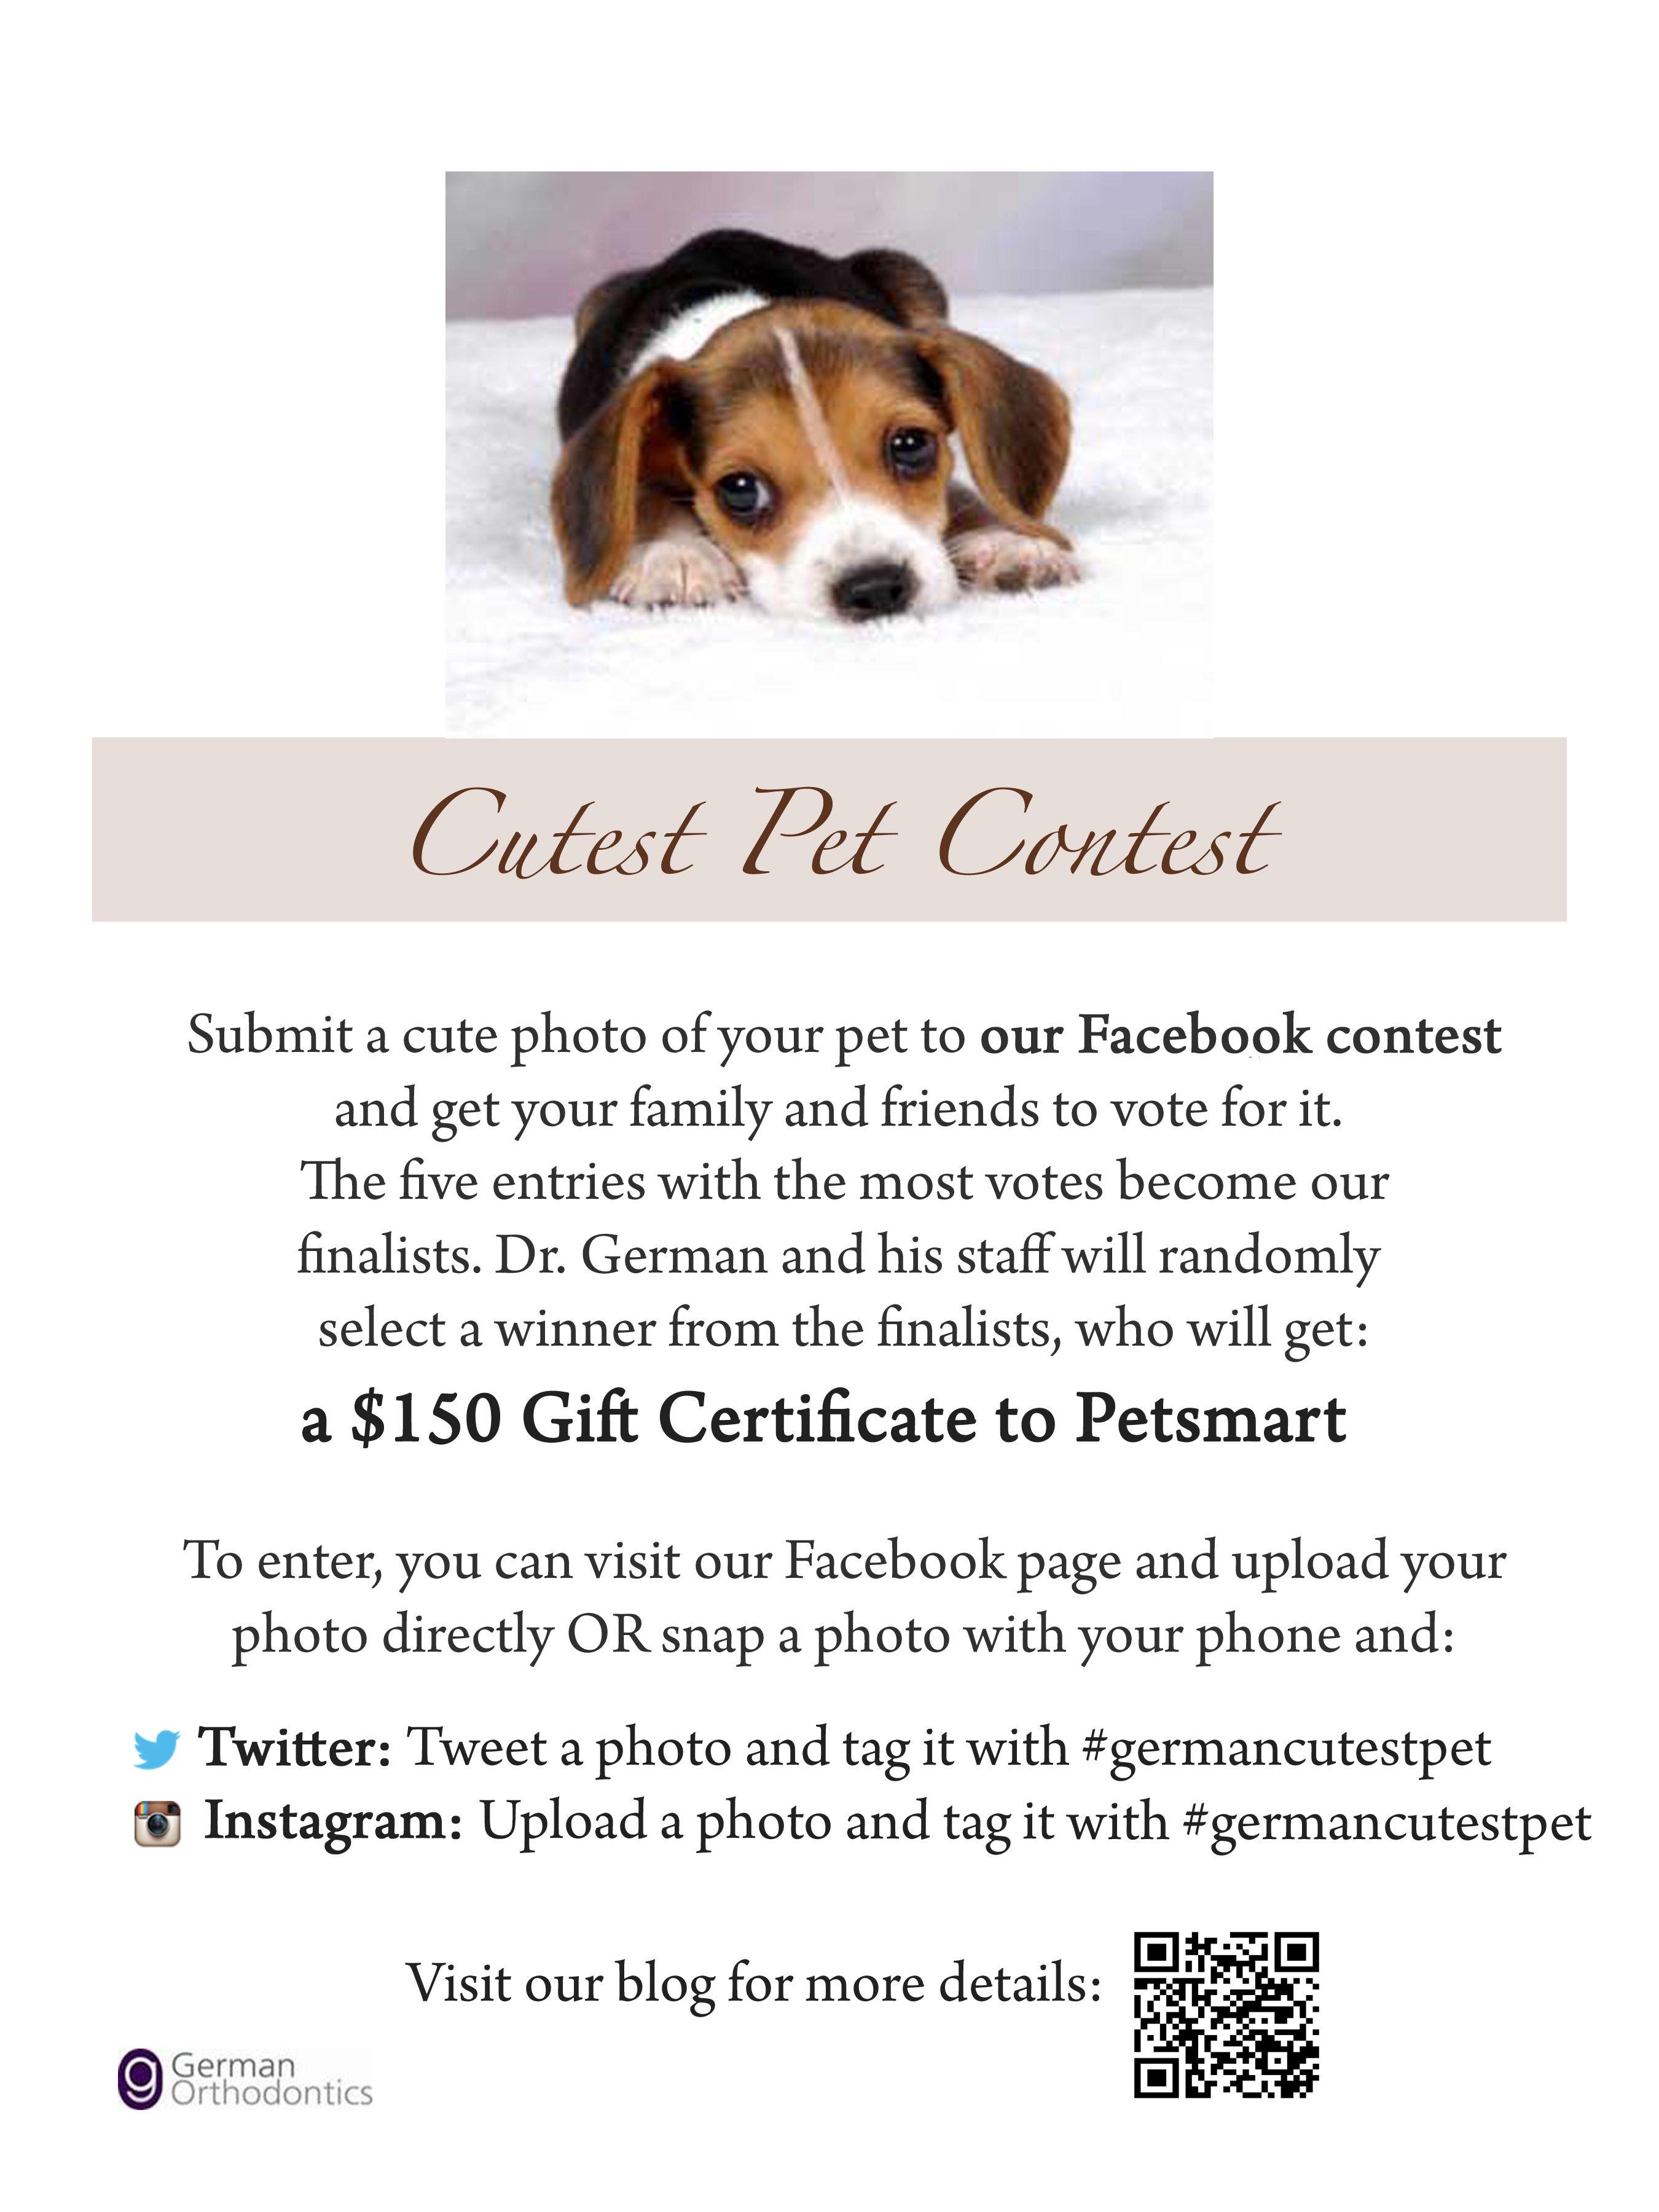 German Orthodontics is running a 2012 Cutest Pet Contest